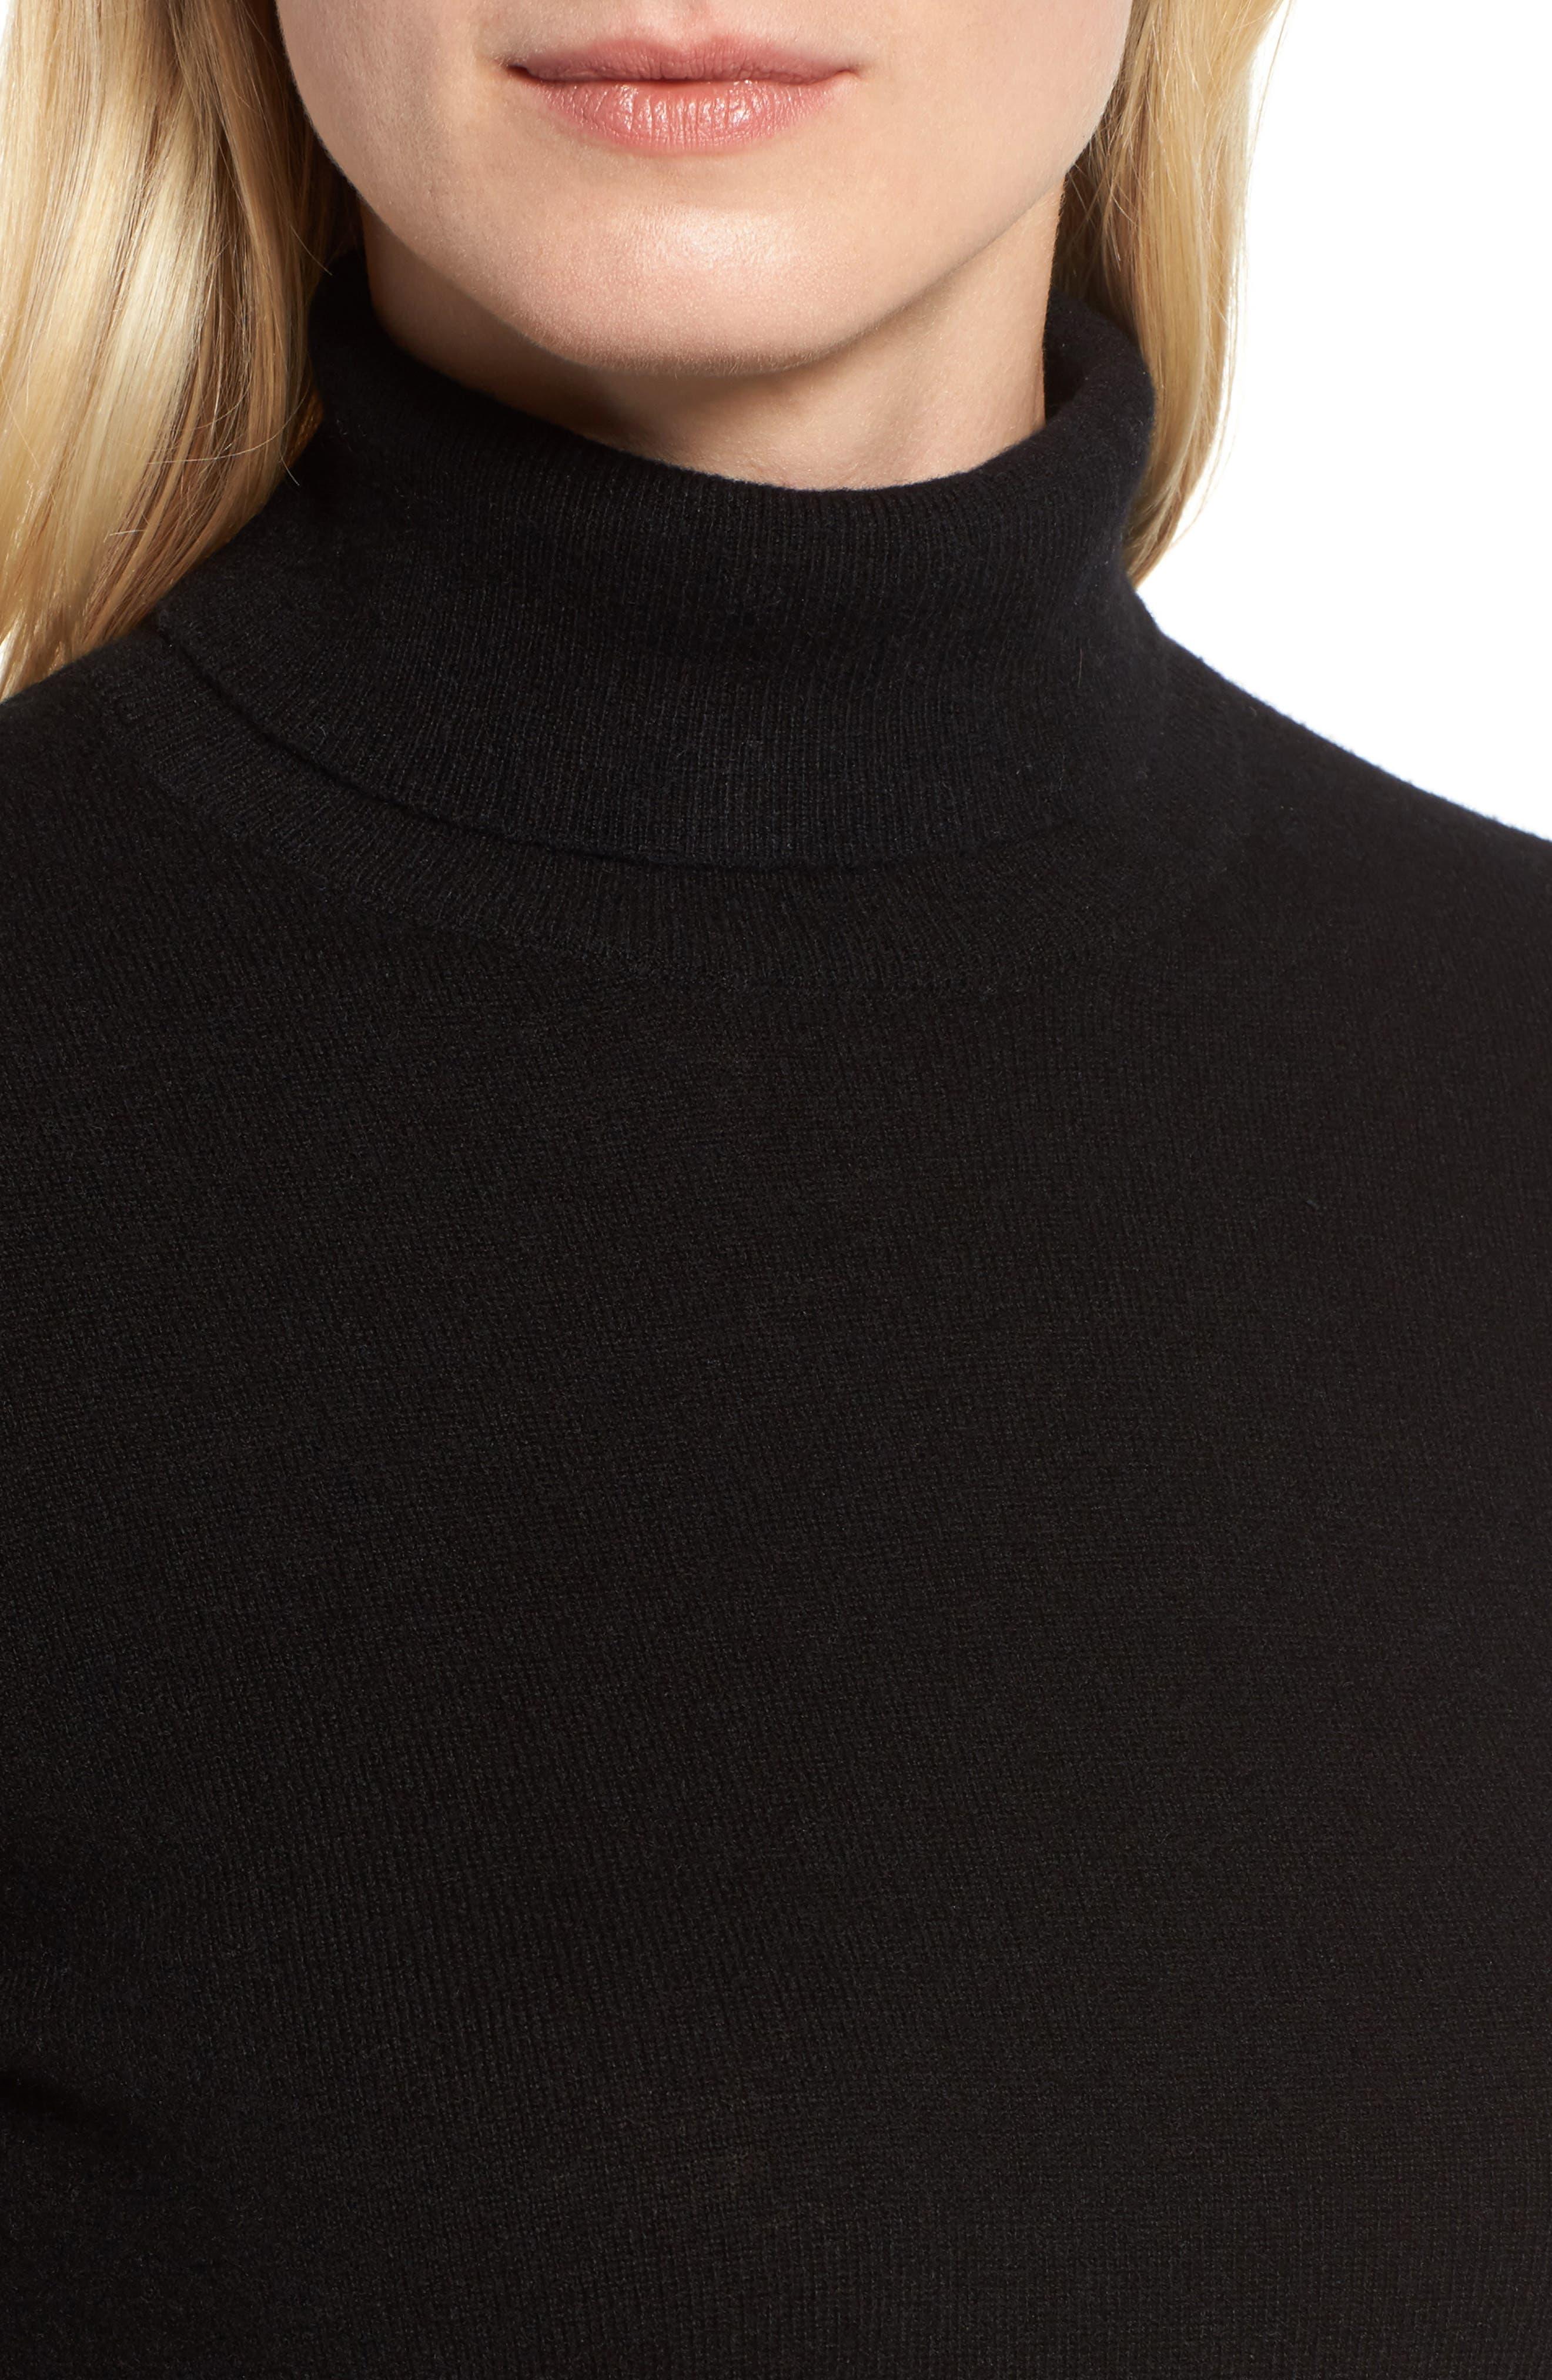 Turtleneck Cashmere Sweater,                             Alternate thumbnail 4, color,                             BLACK